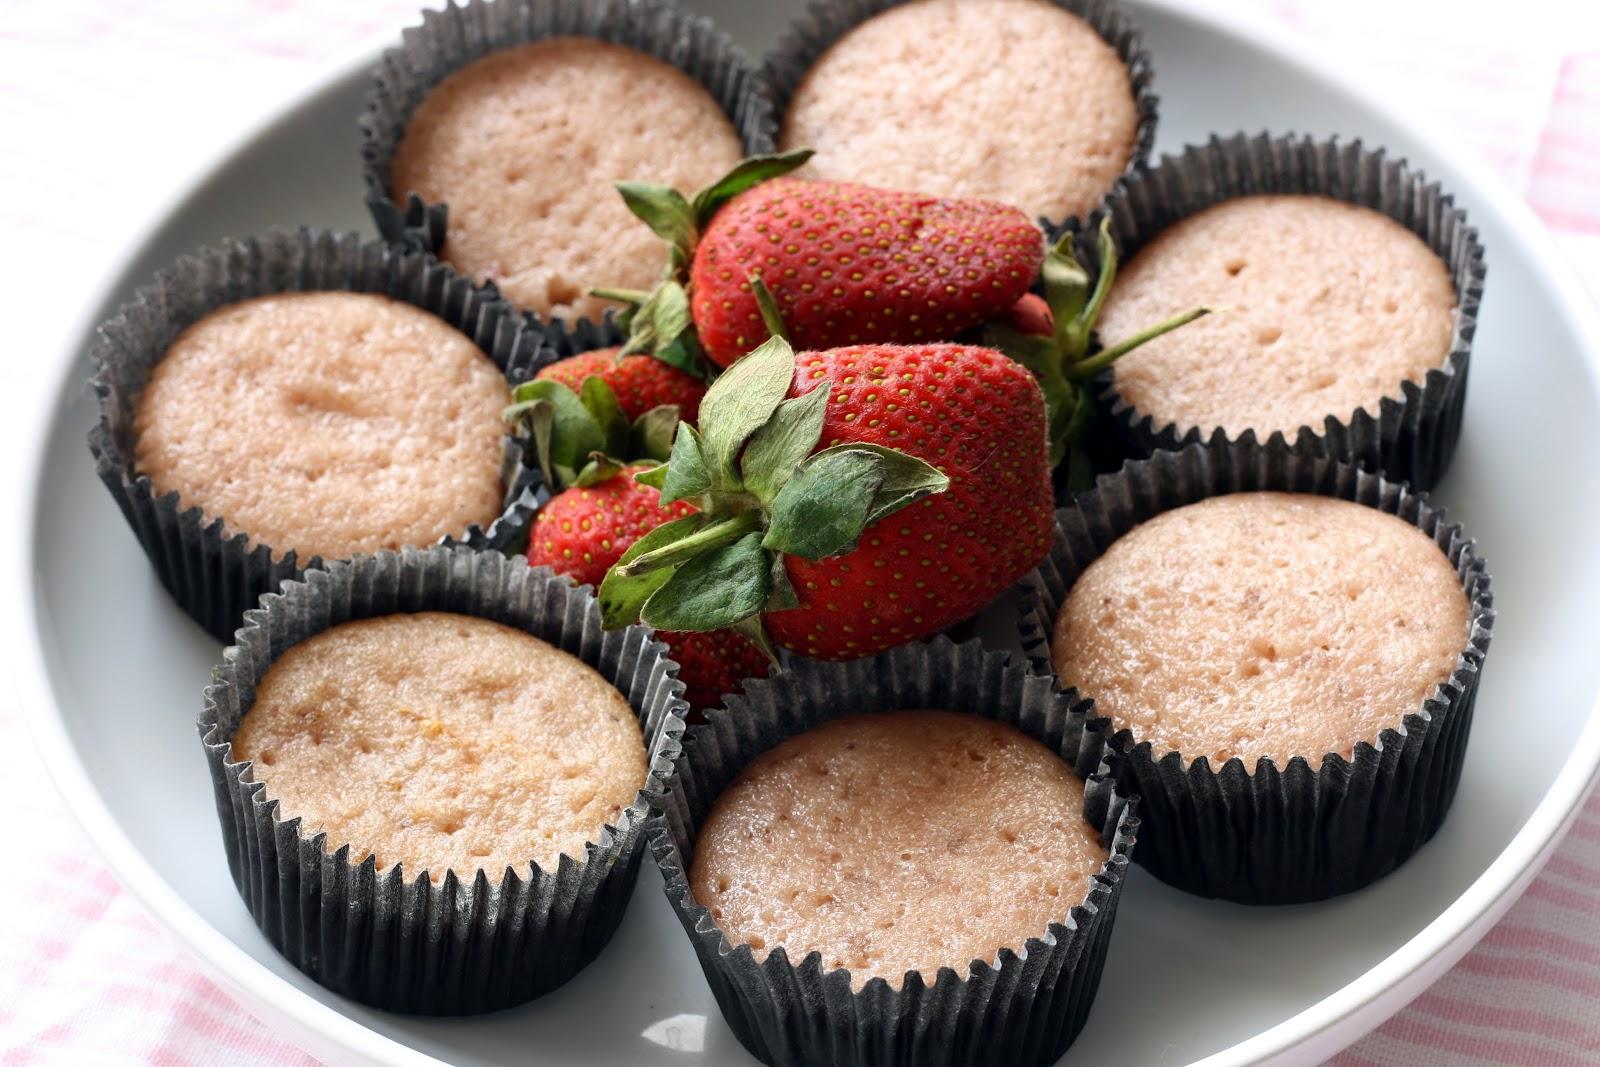 bake at home strawberries colada cupcakes